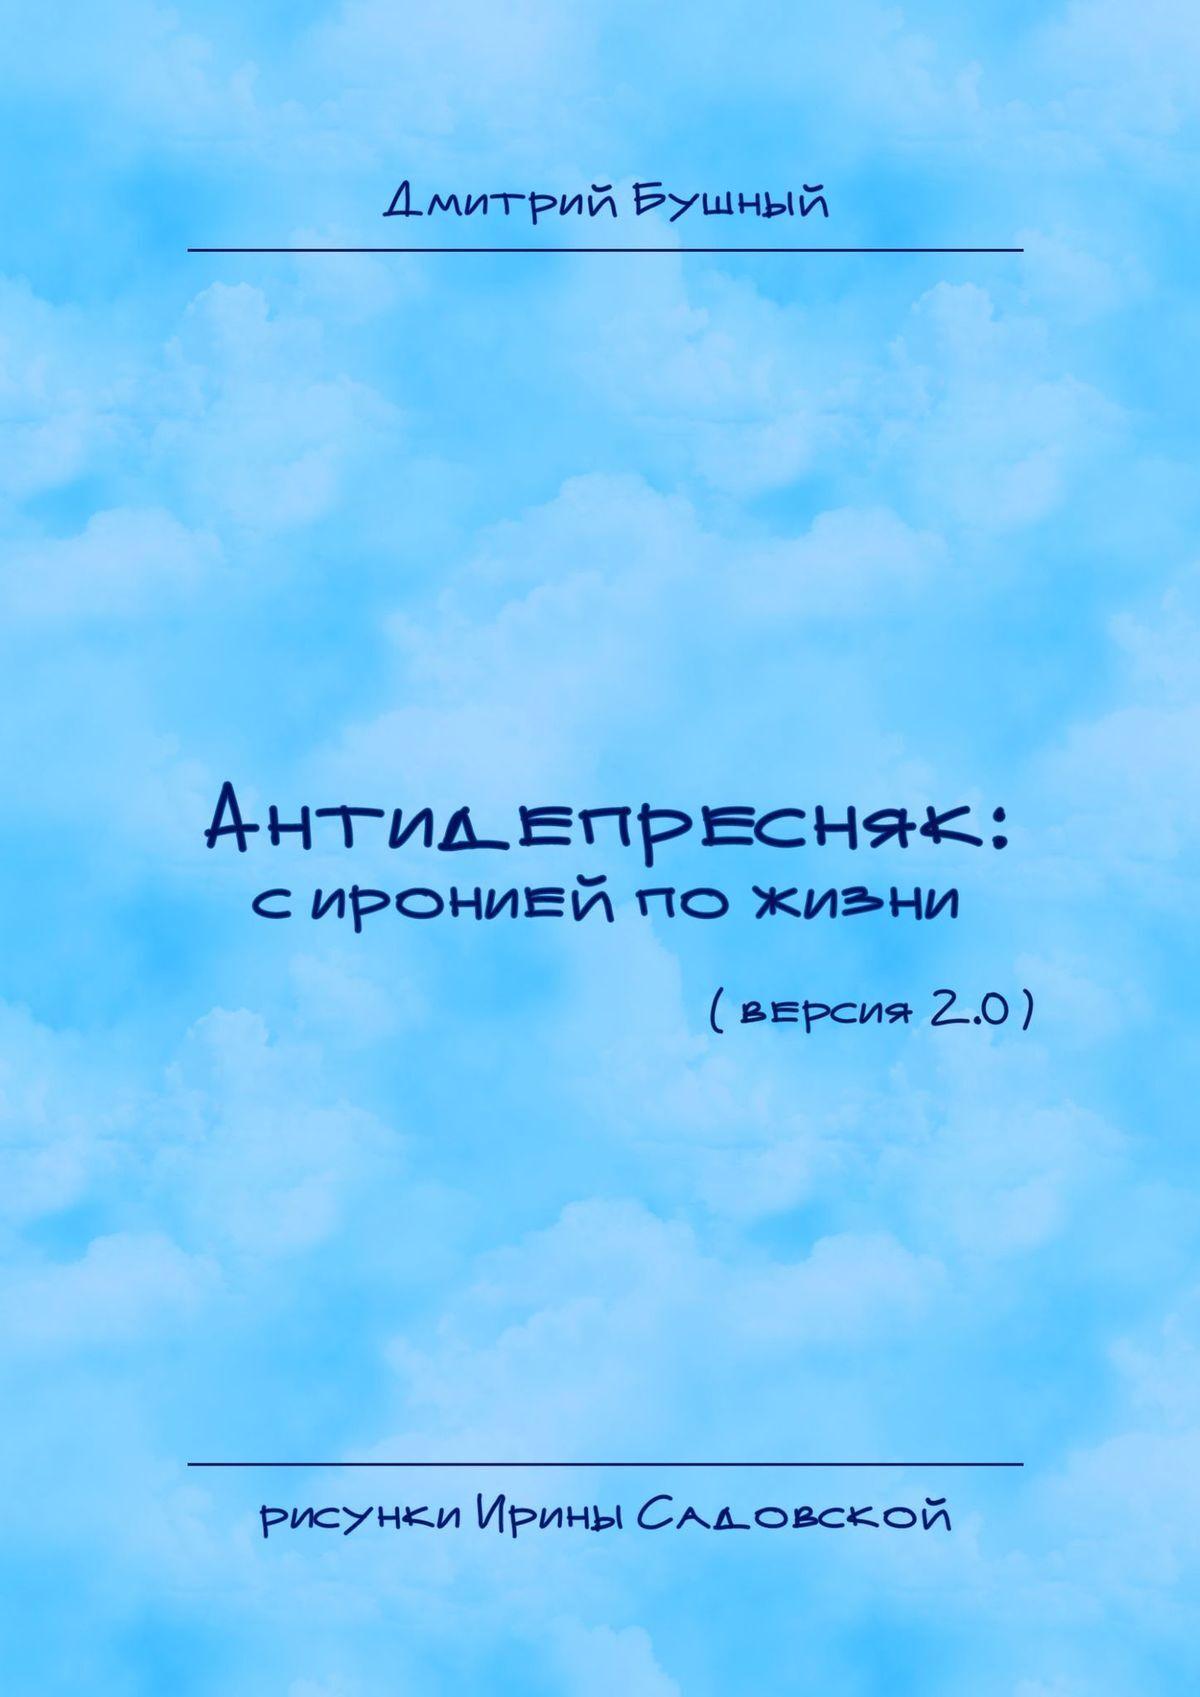 Дмитрий Бушный Антидепресняк: с иронией по жизни. (Версия 2.0) fallout 4 far harbor дополнение [pc цифровая версия] цифровая версия